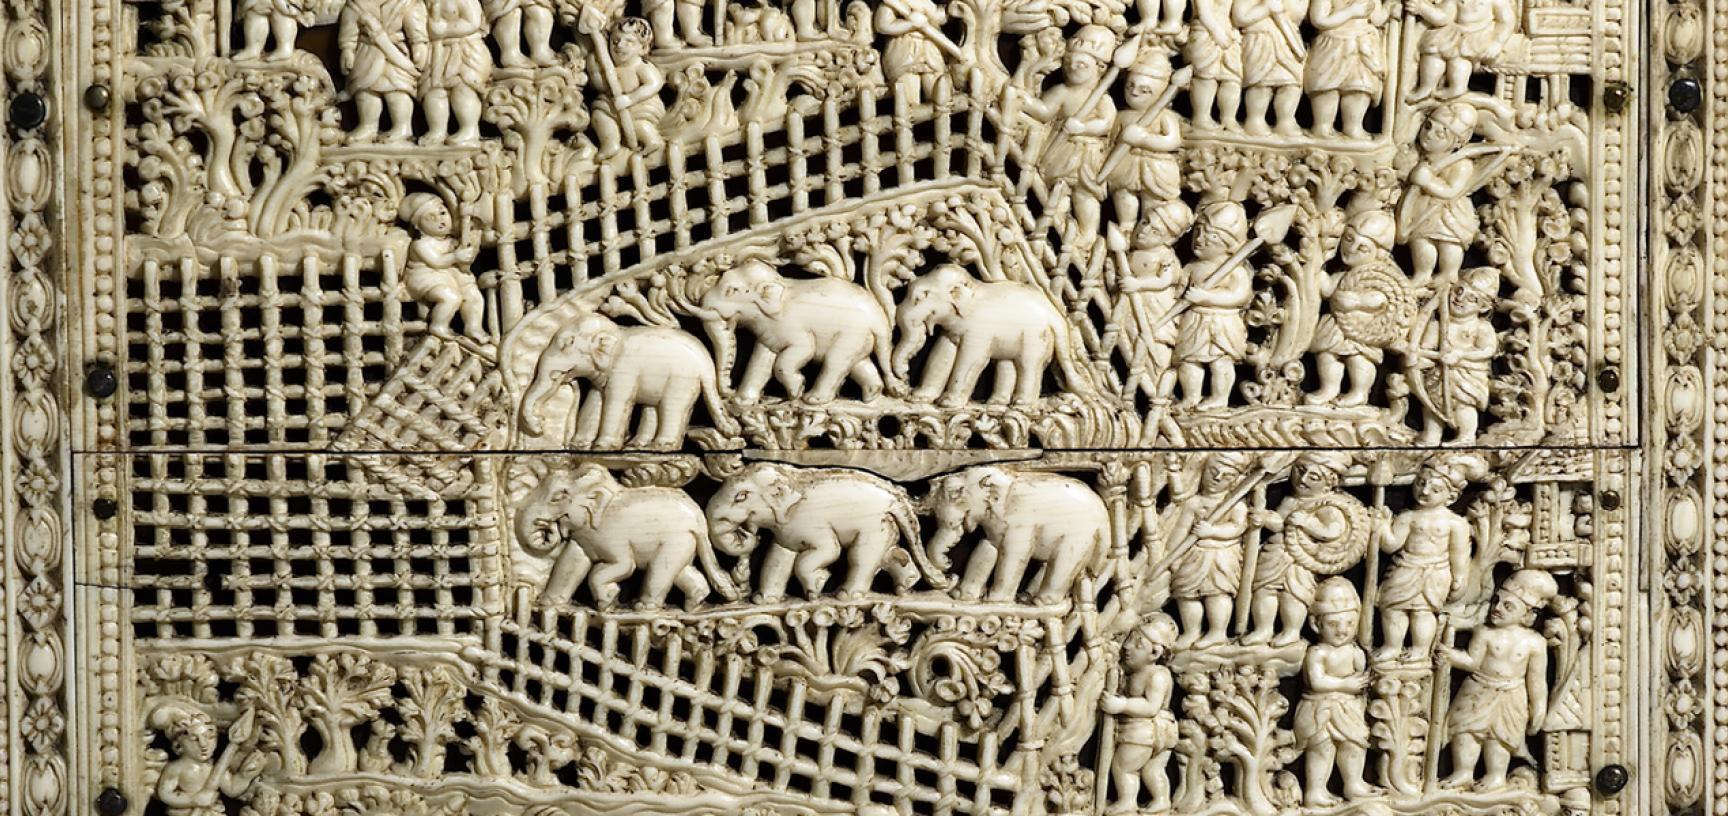 MUGHAL INDIA at the Ashmolean